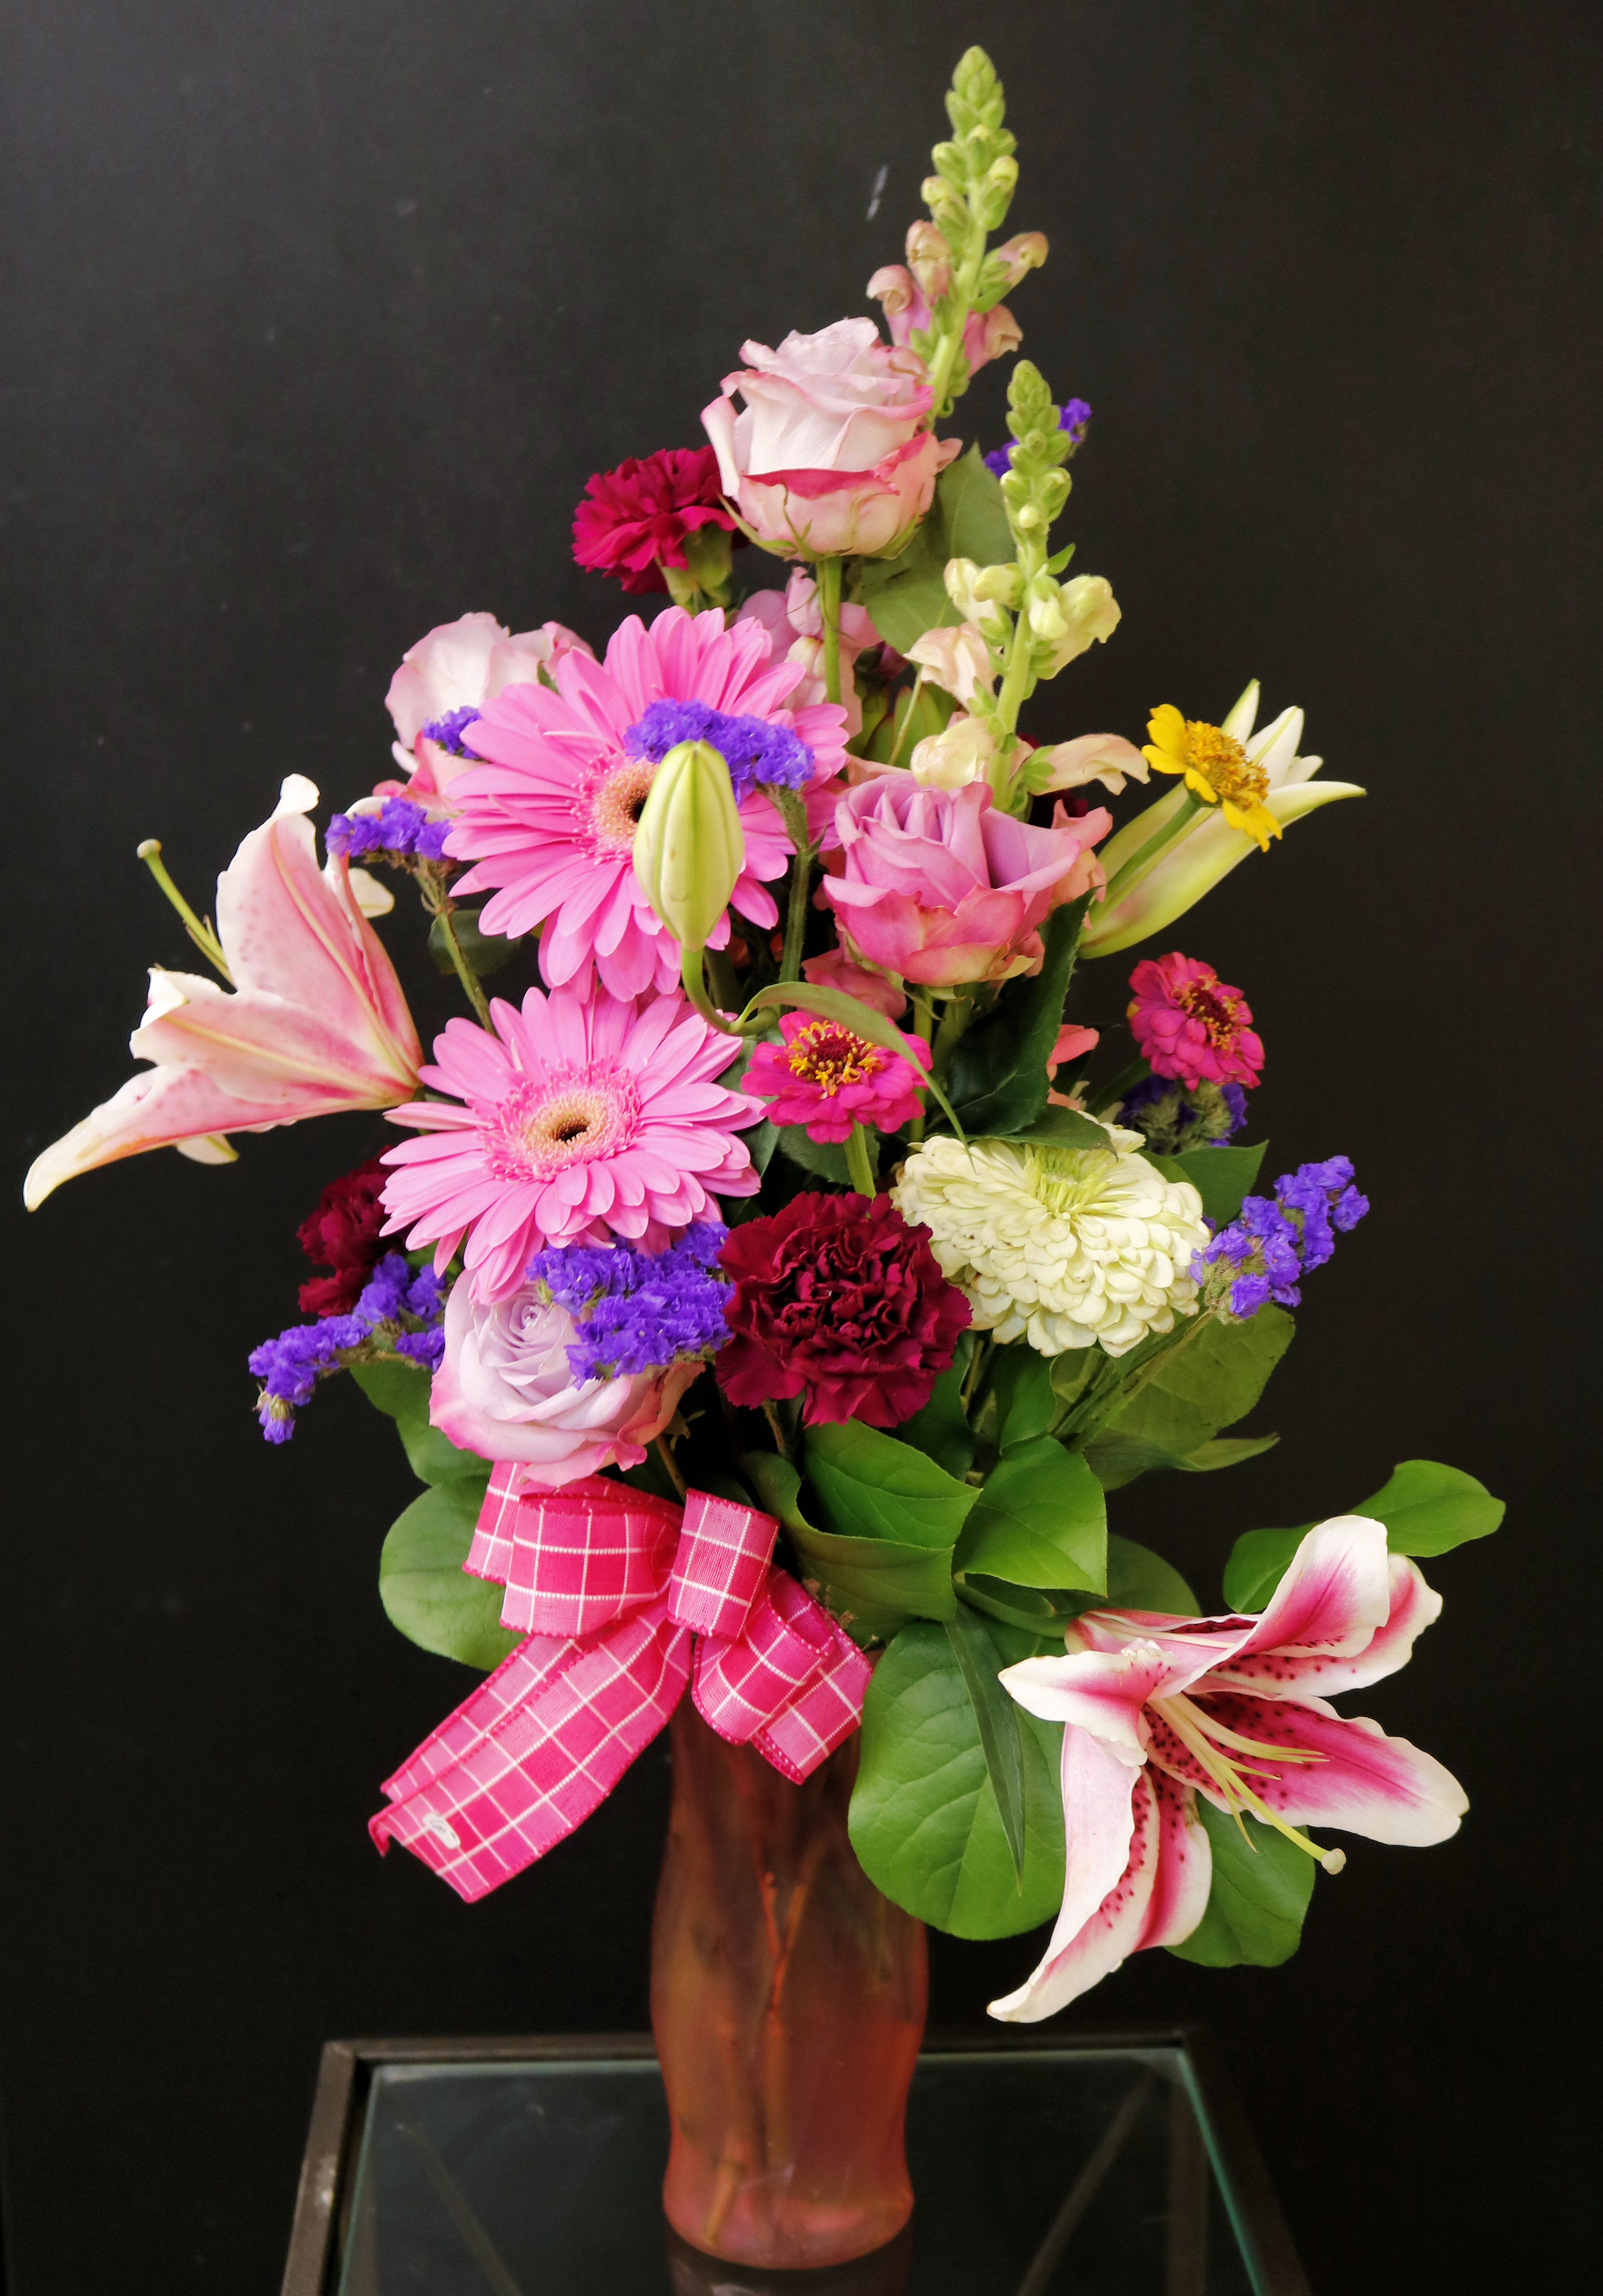 Lillies, Gerbers, Carnations